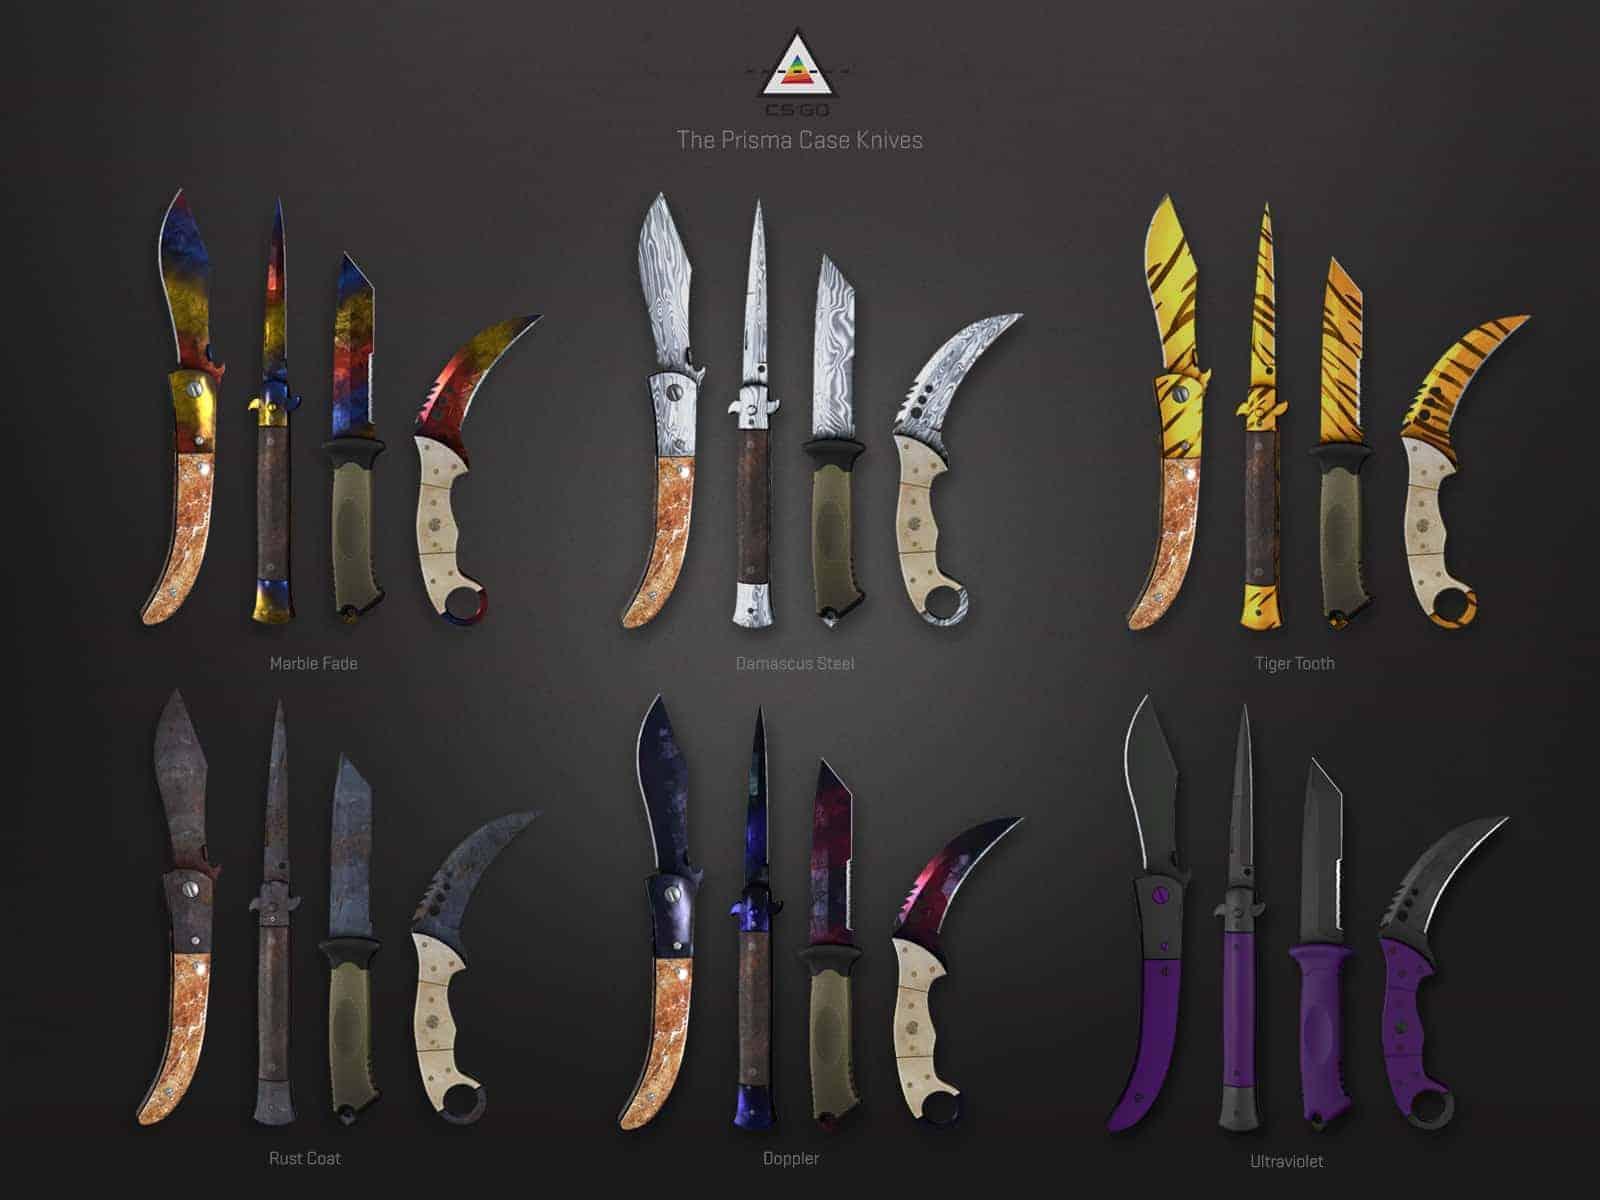 prisma case22 knives